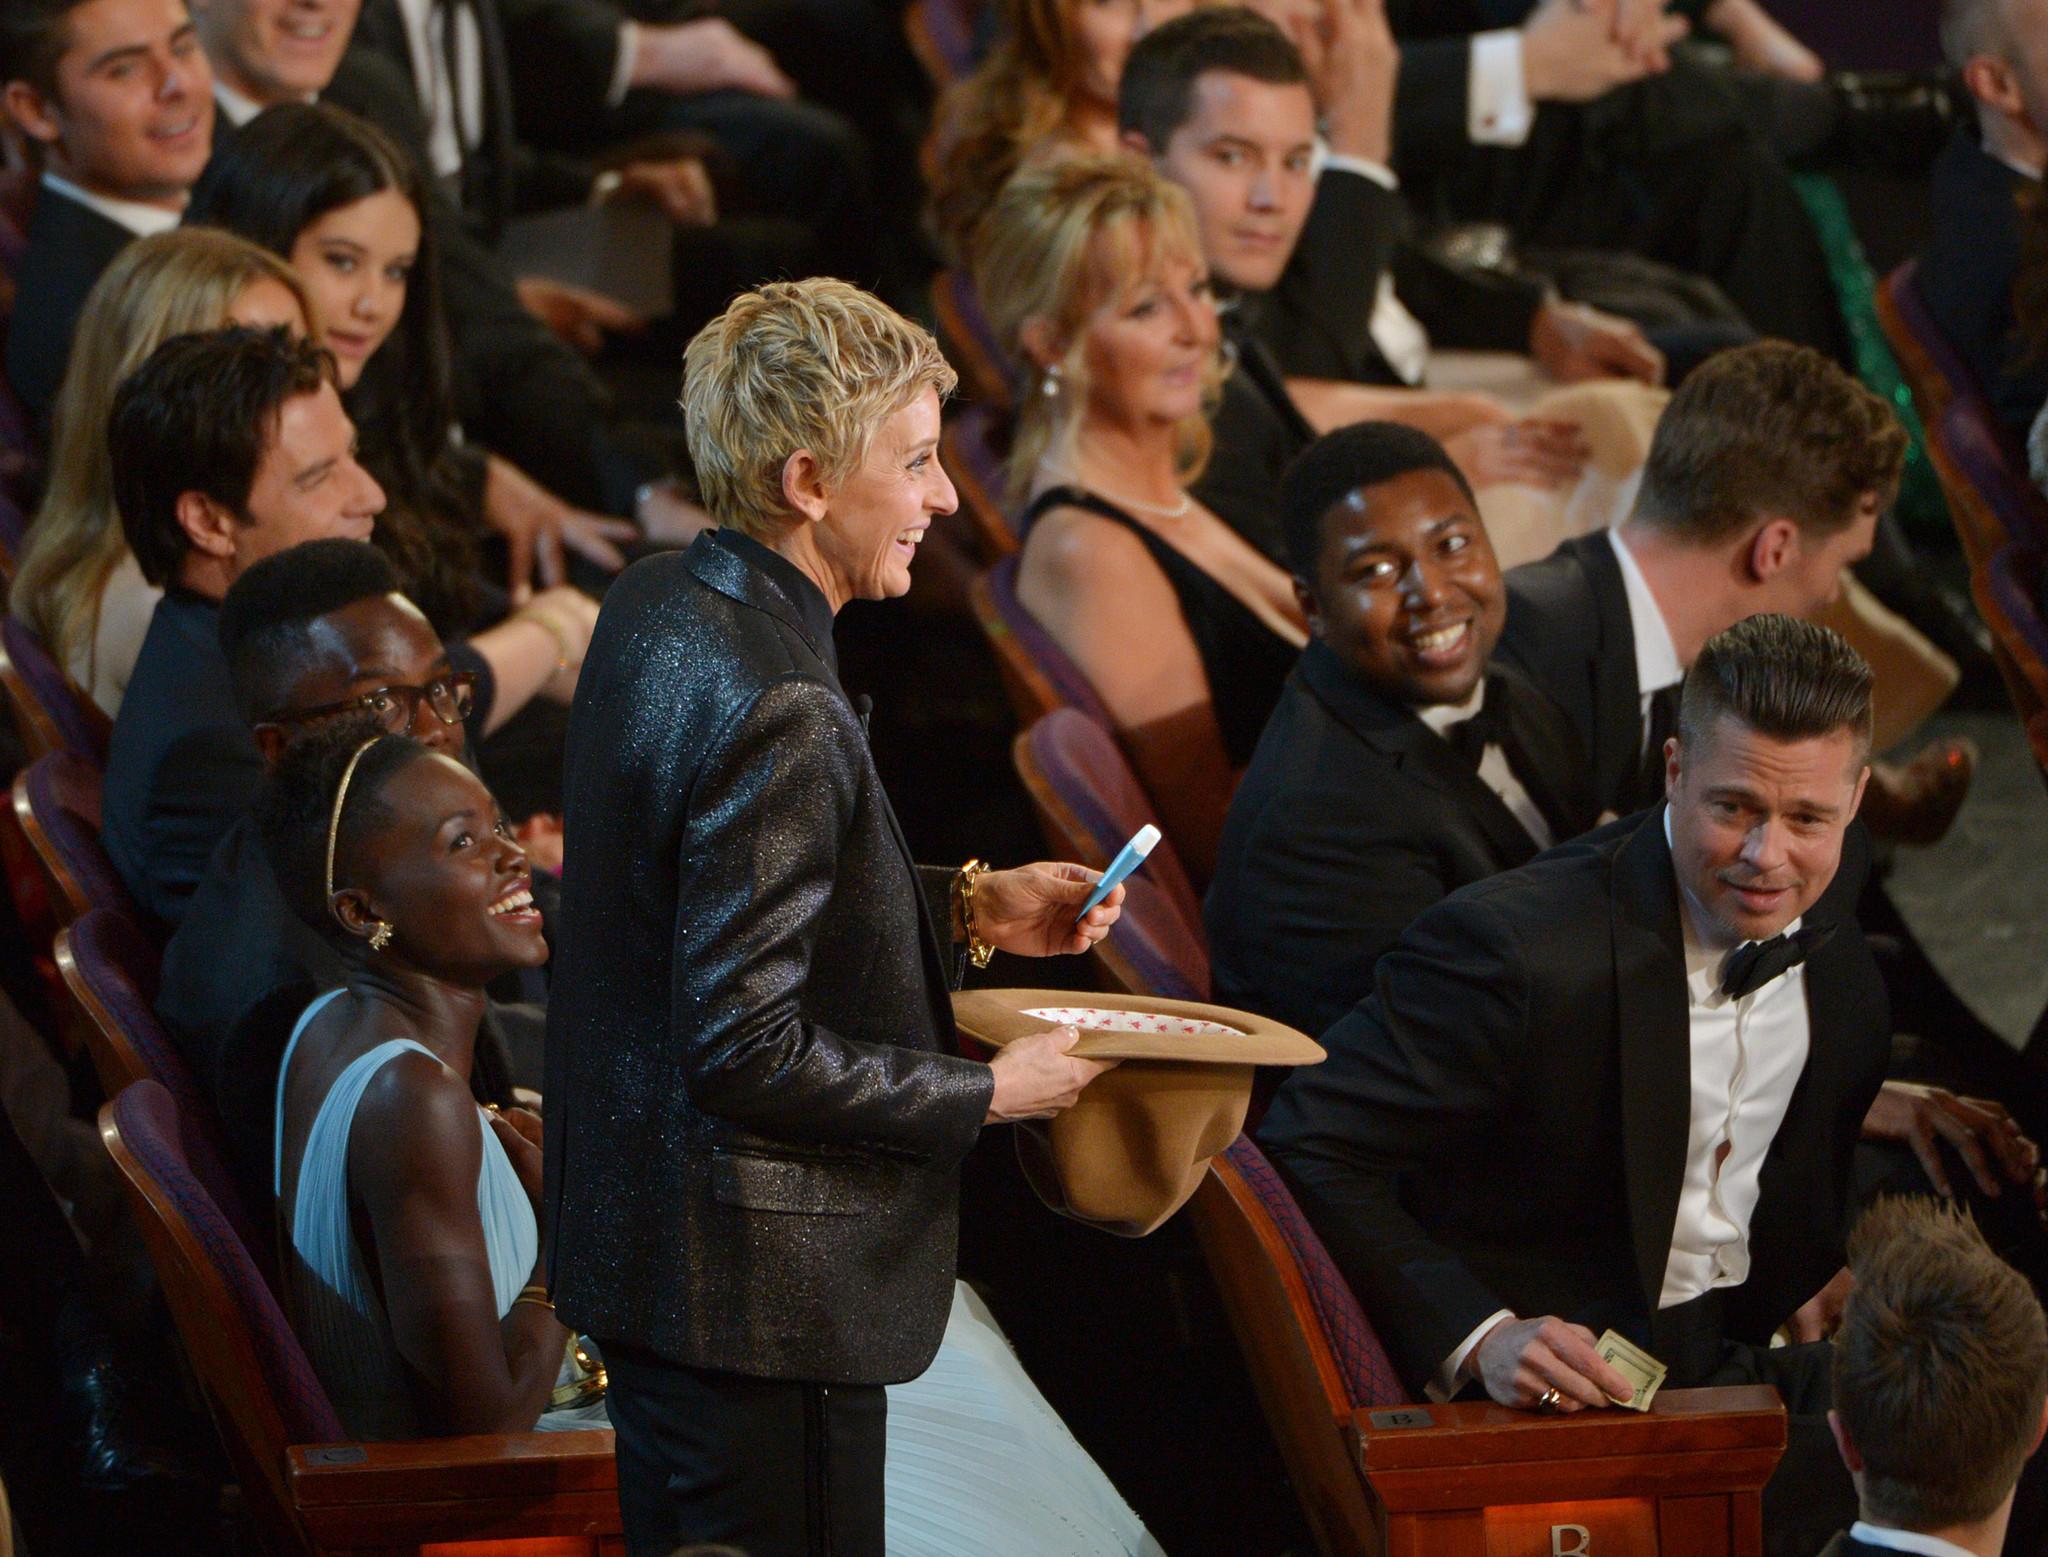 Ellen Degeneres En Los Oscars 2014